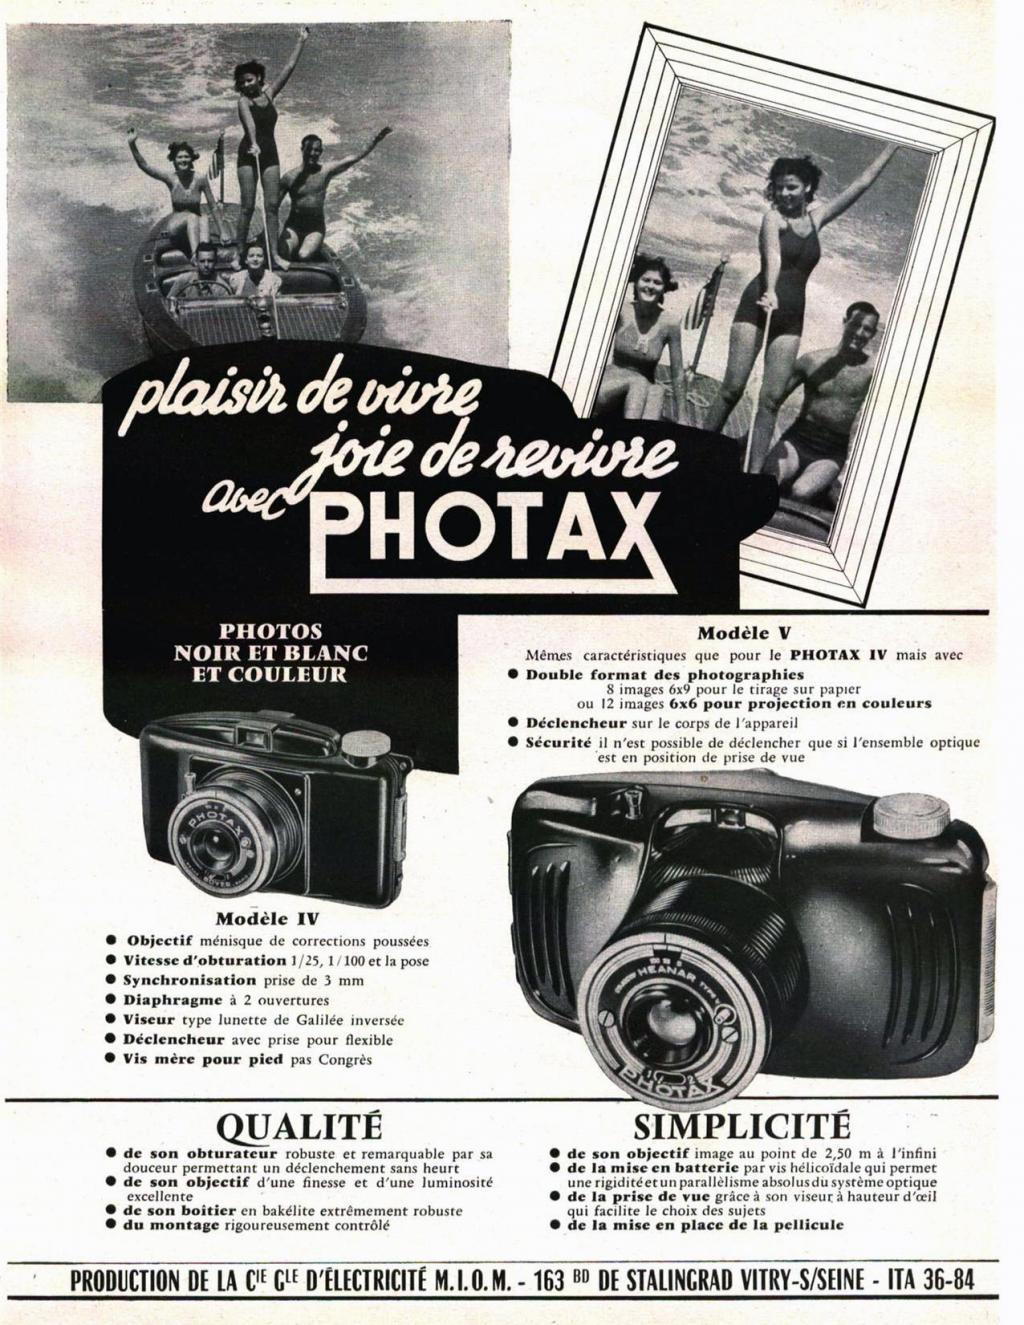 Wallpaper Appareils photos 0029-6 M.I.O.M Photax V , collection AMI